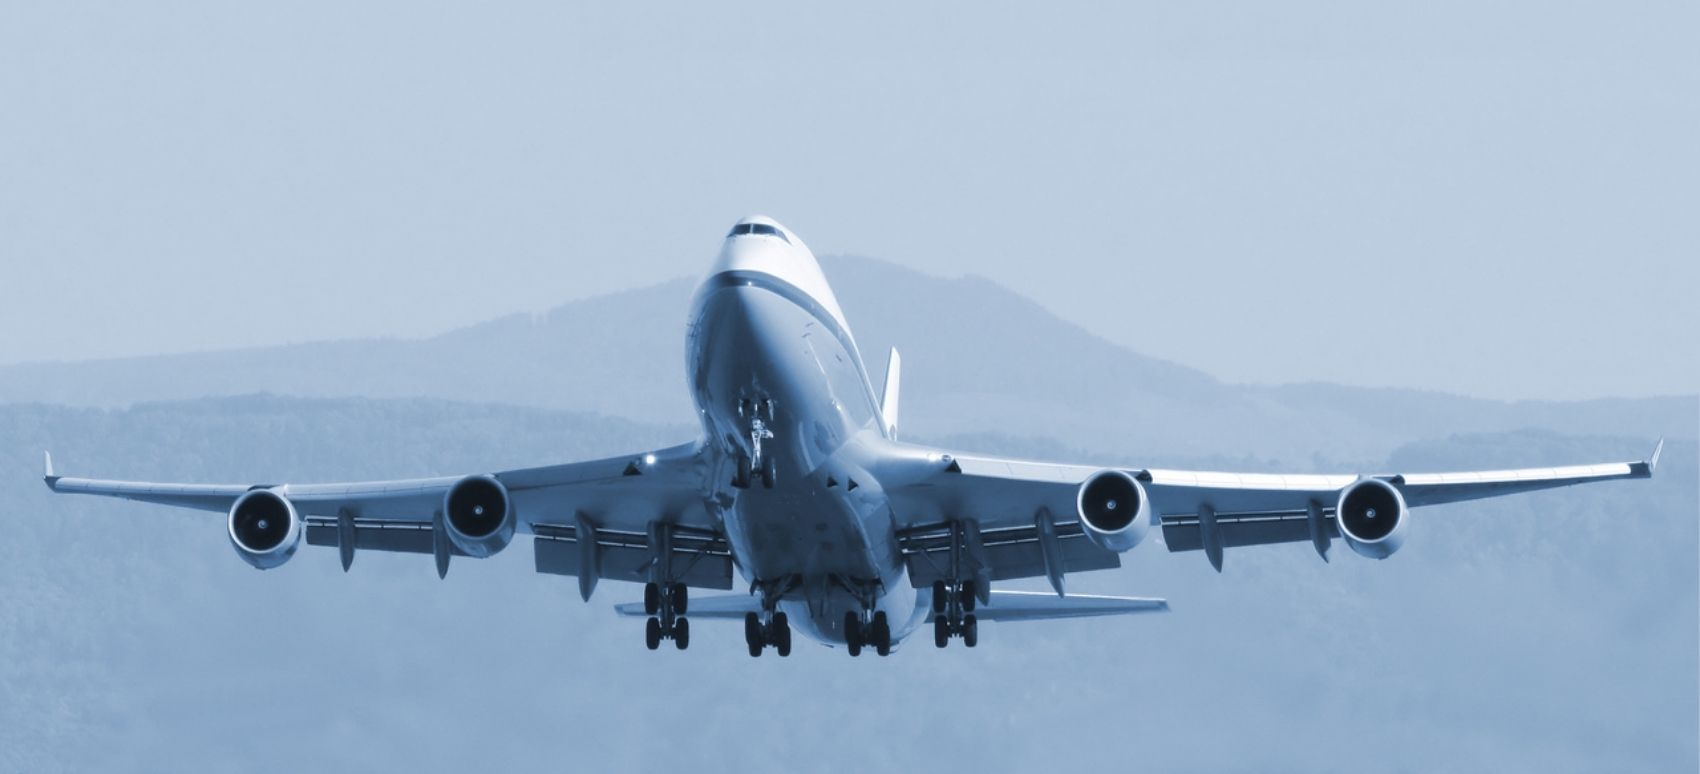 Red de vuelos chárter | DSV